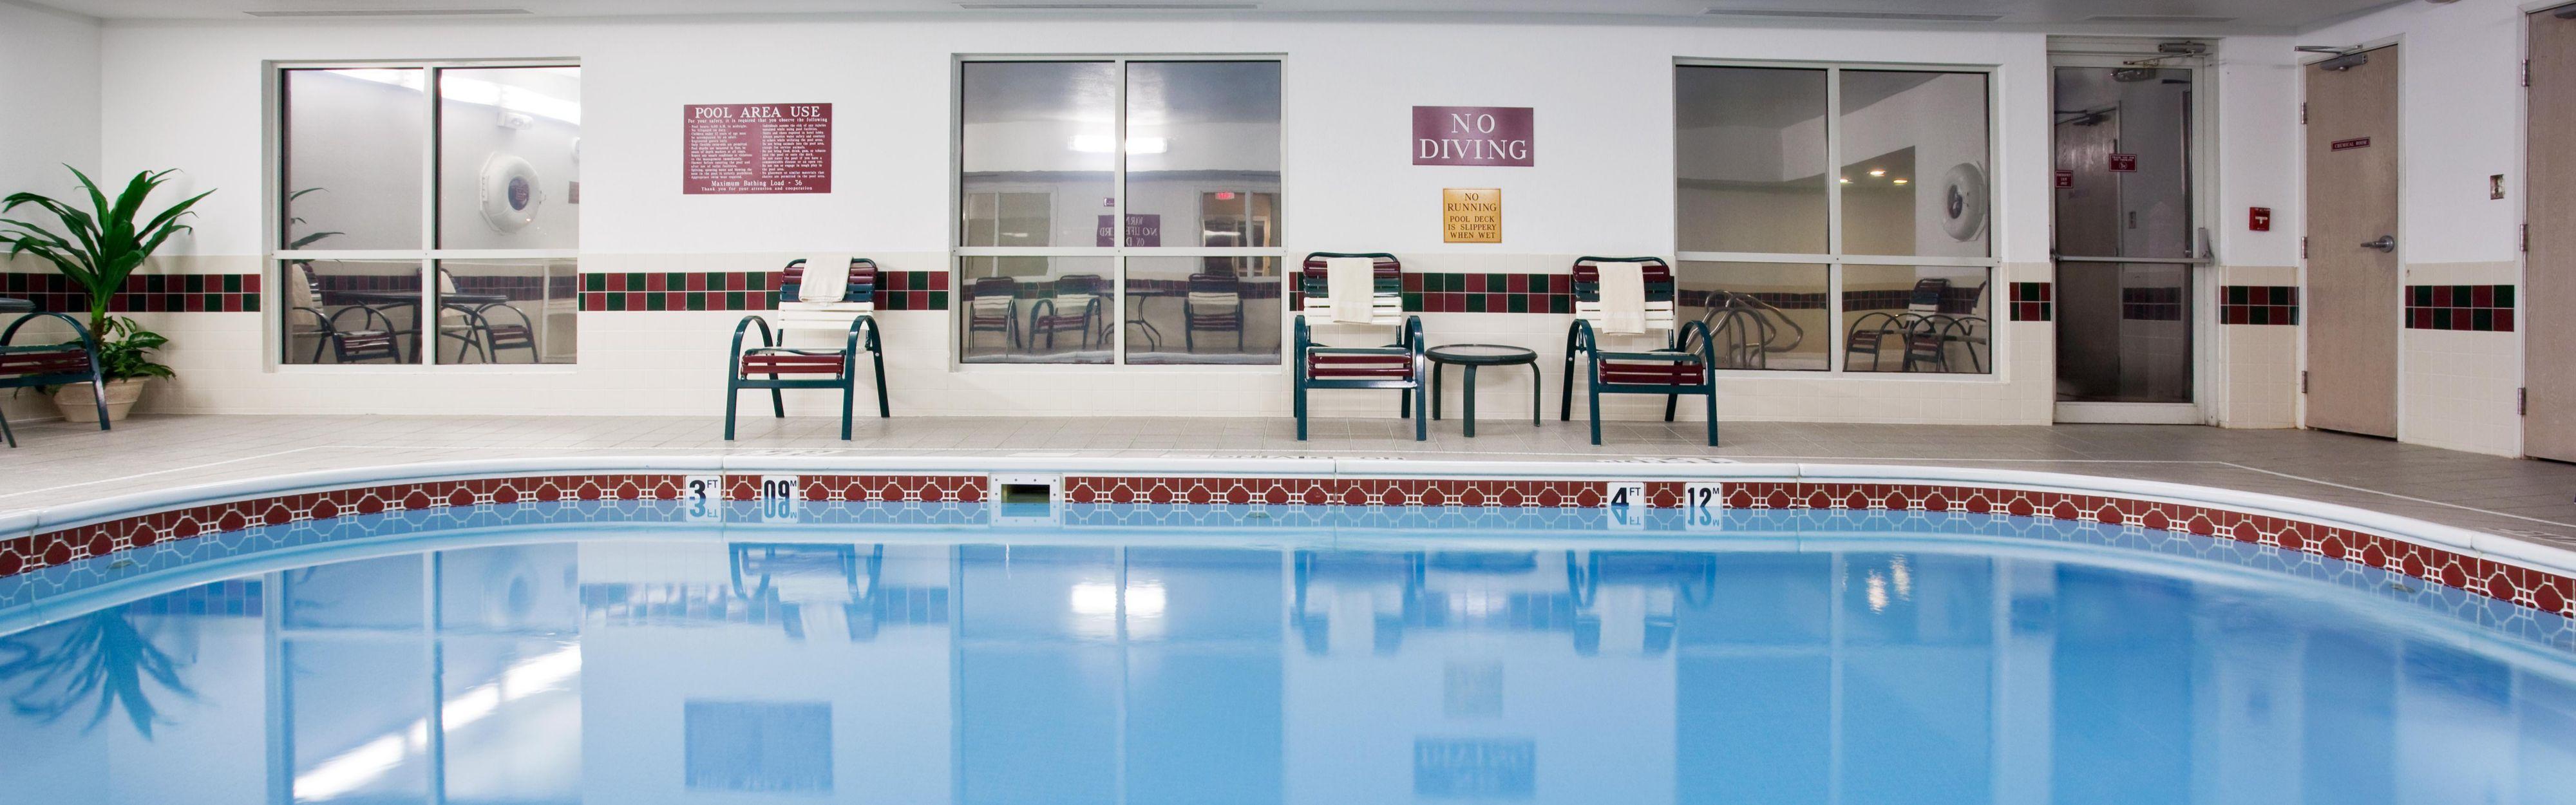 Holiday Inn Express Greeley image 2